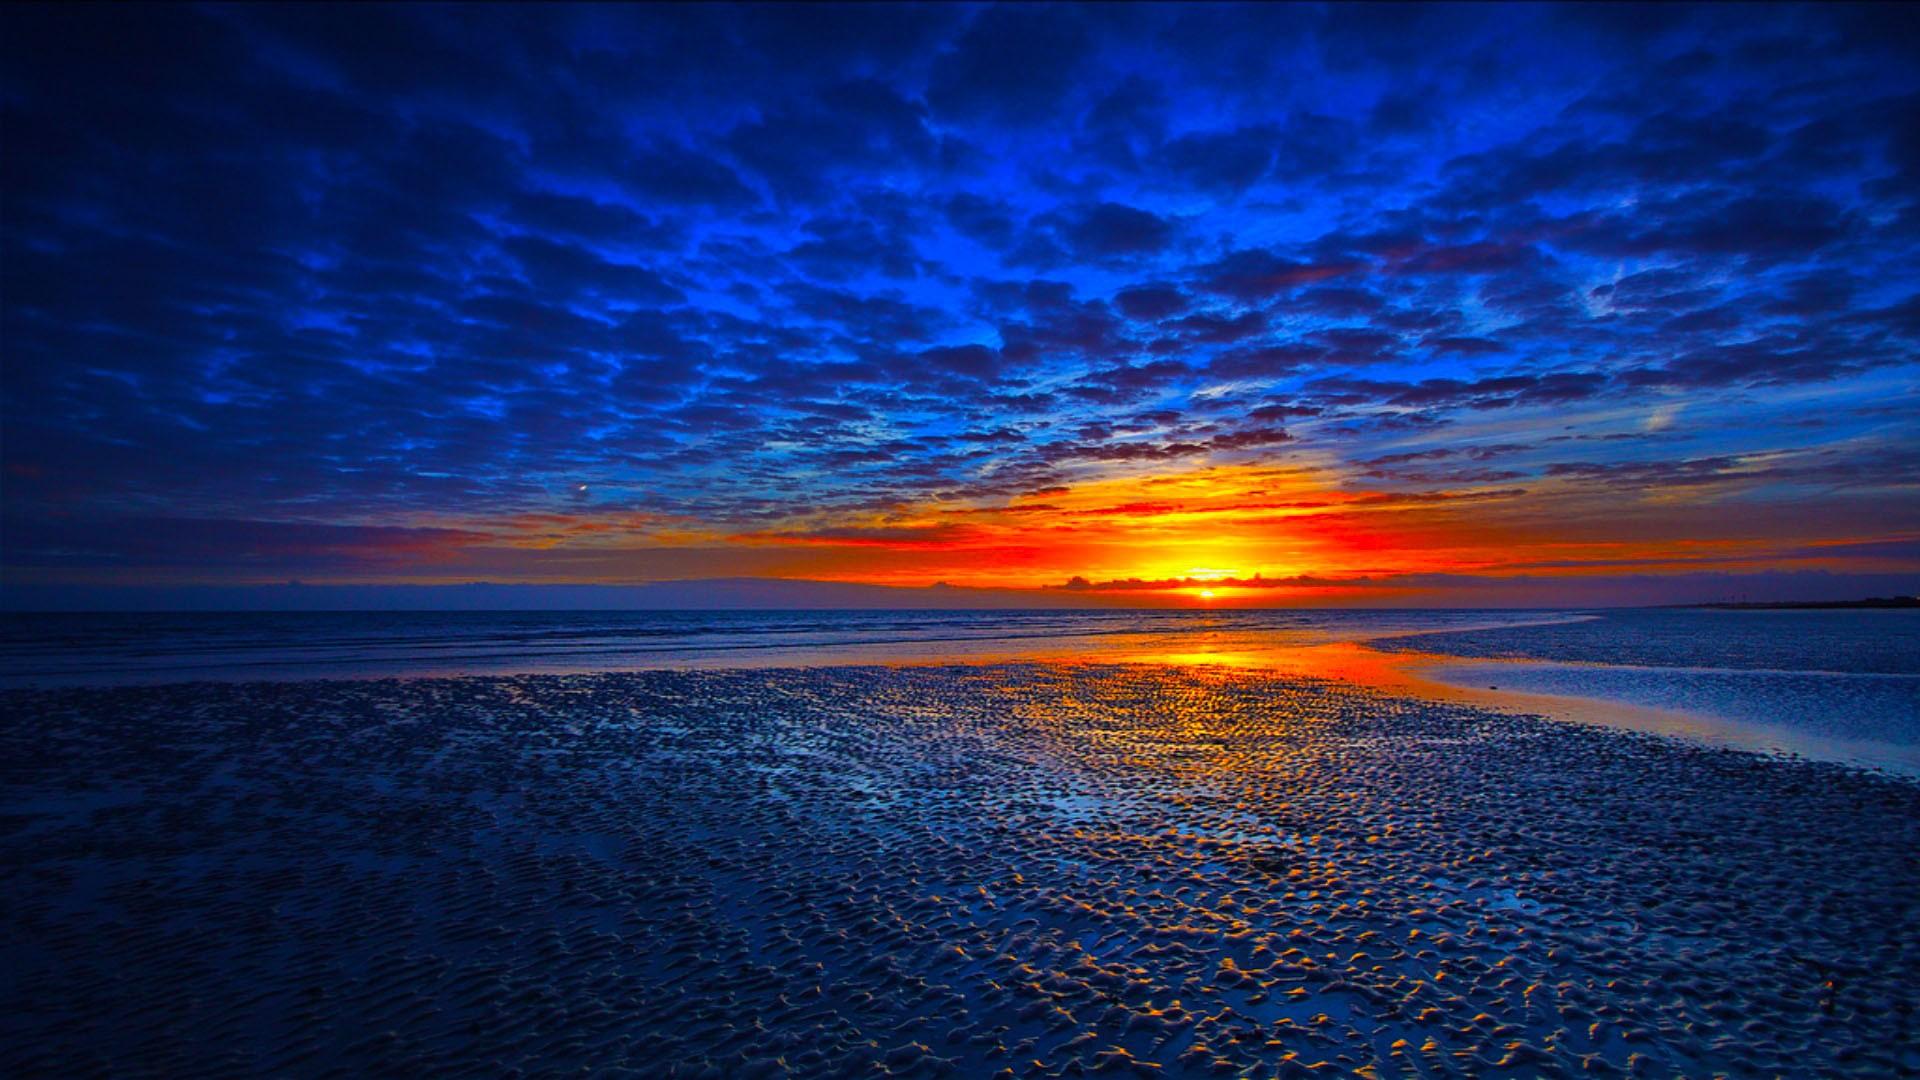 sunset desktop backgrounds